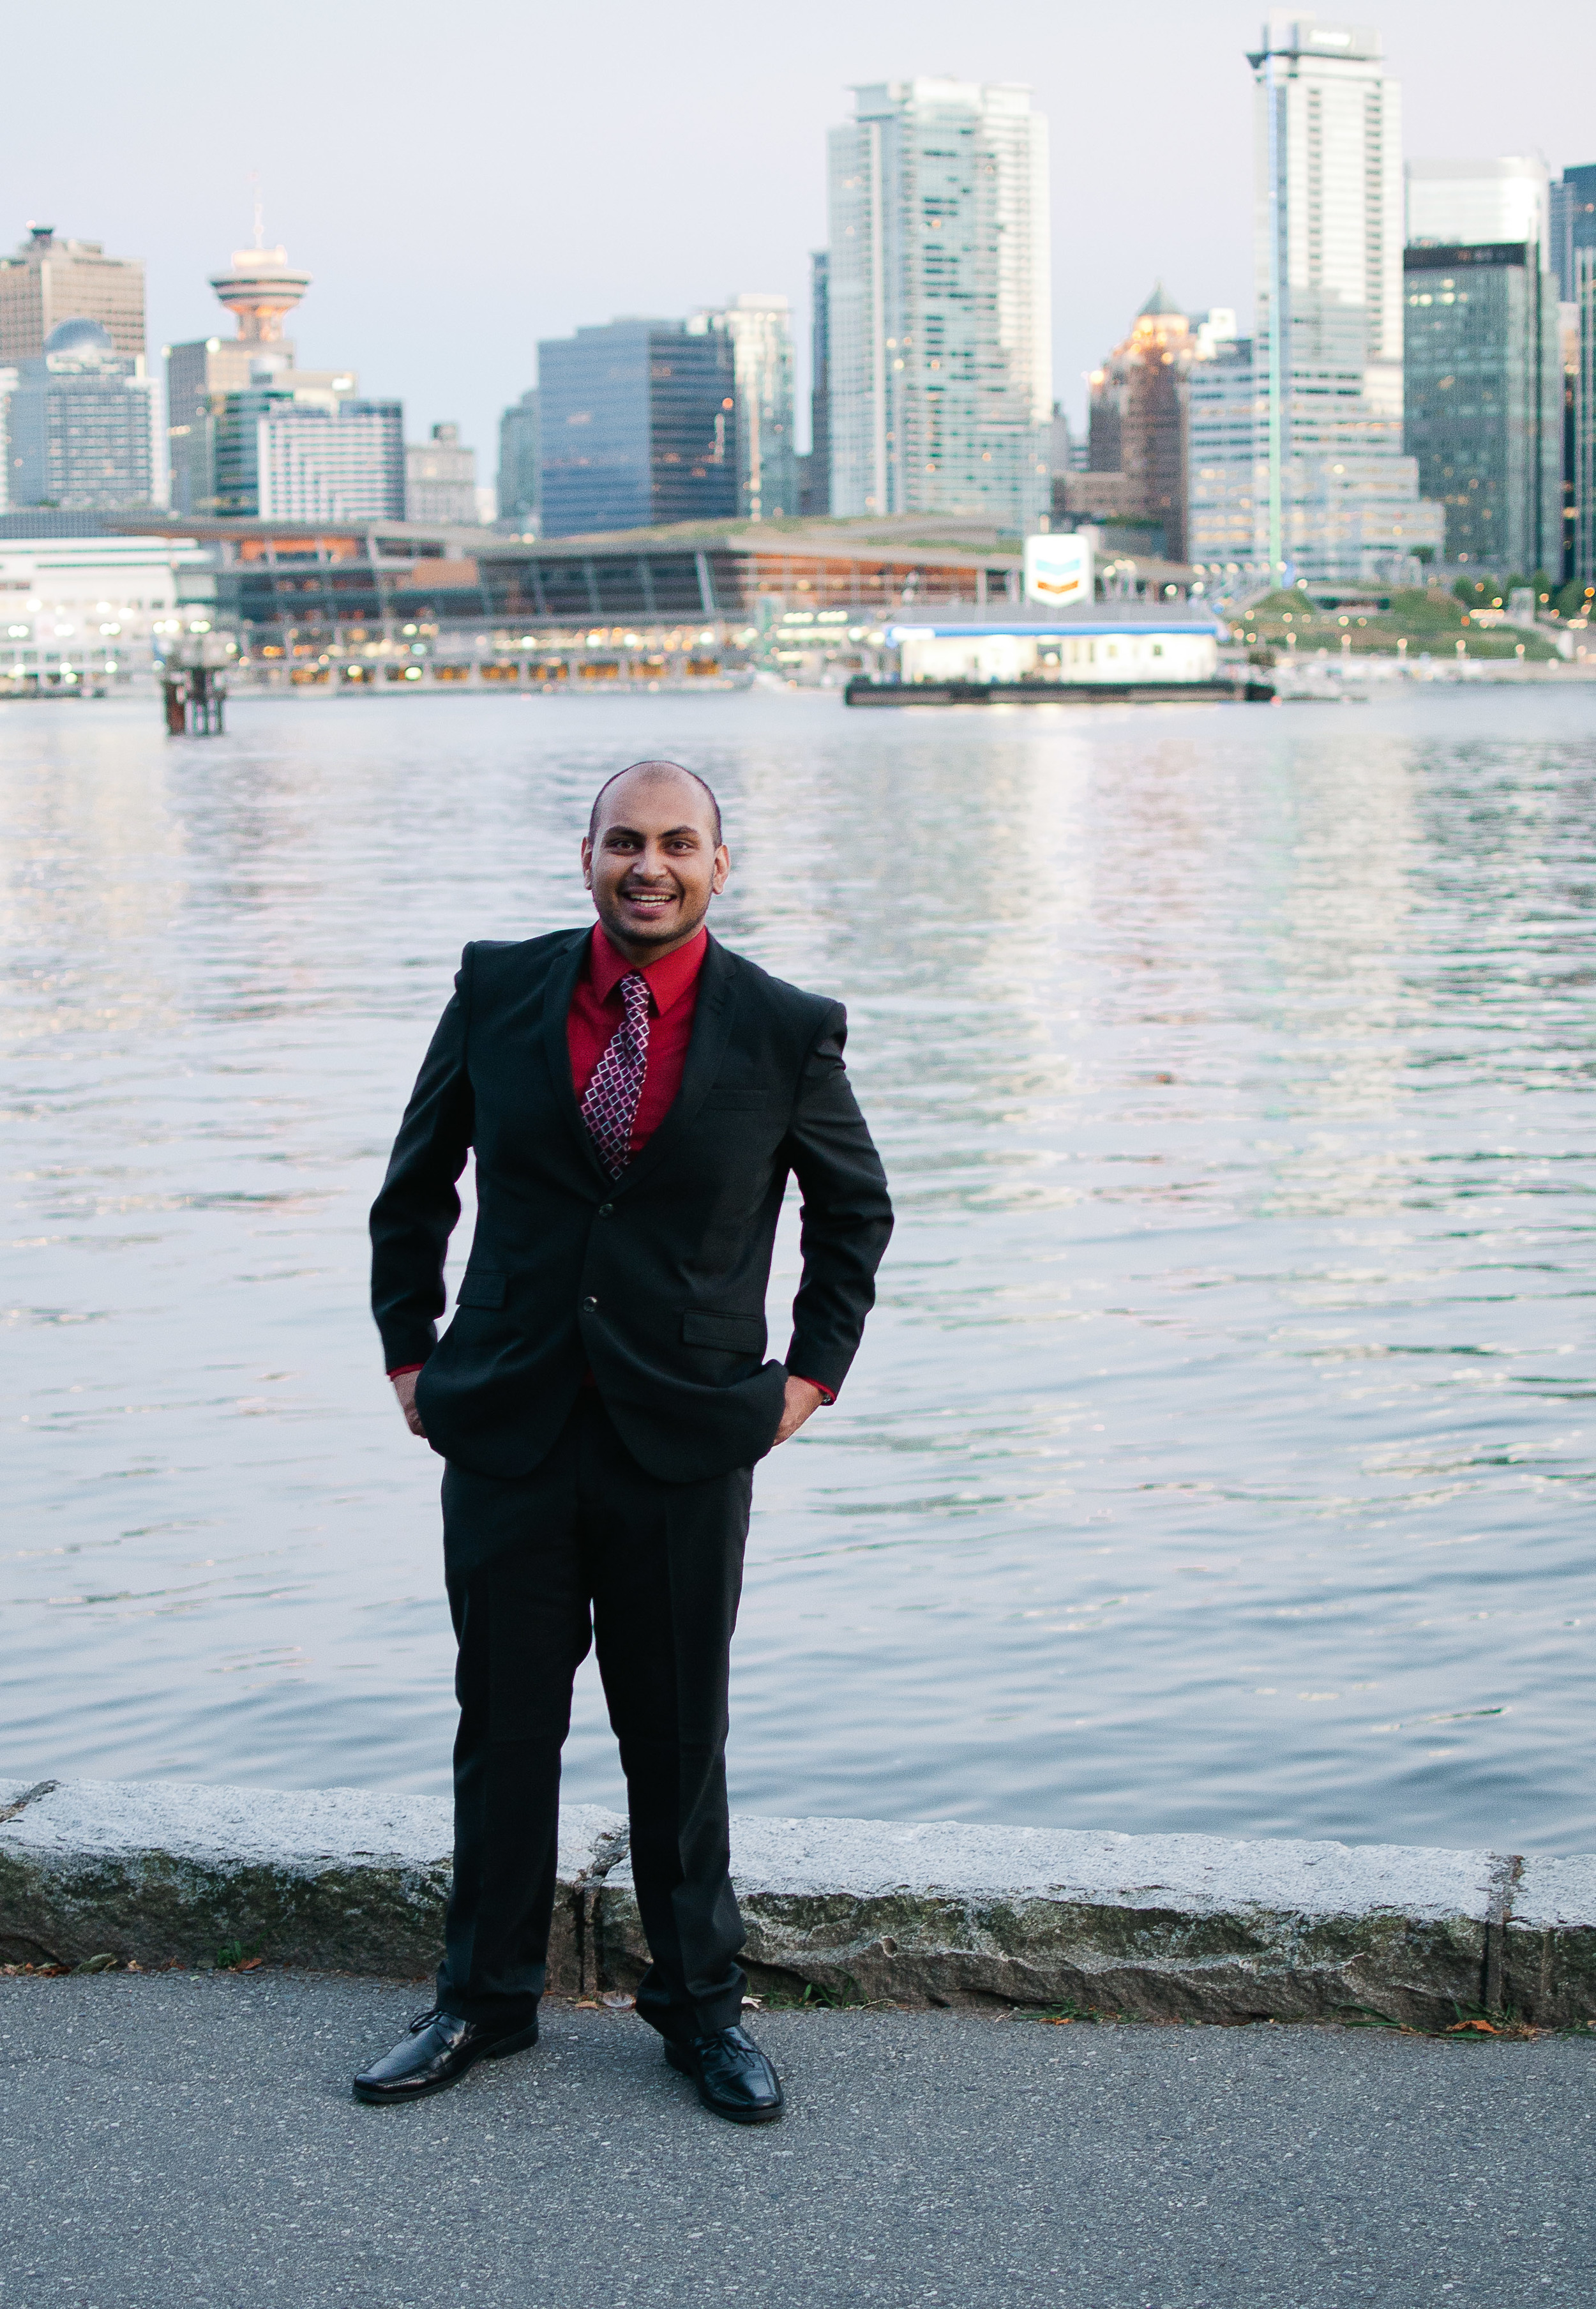 Amresh + Salona_Katie Powell Photography Vancouver Engagement Stanley Park Portraits-23.jpg